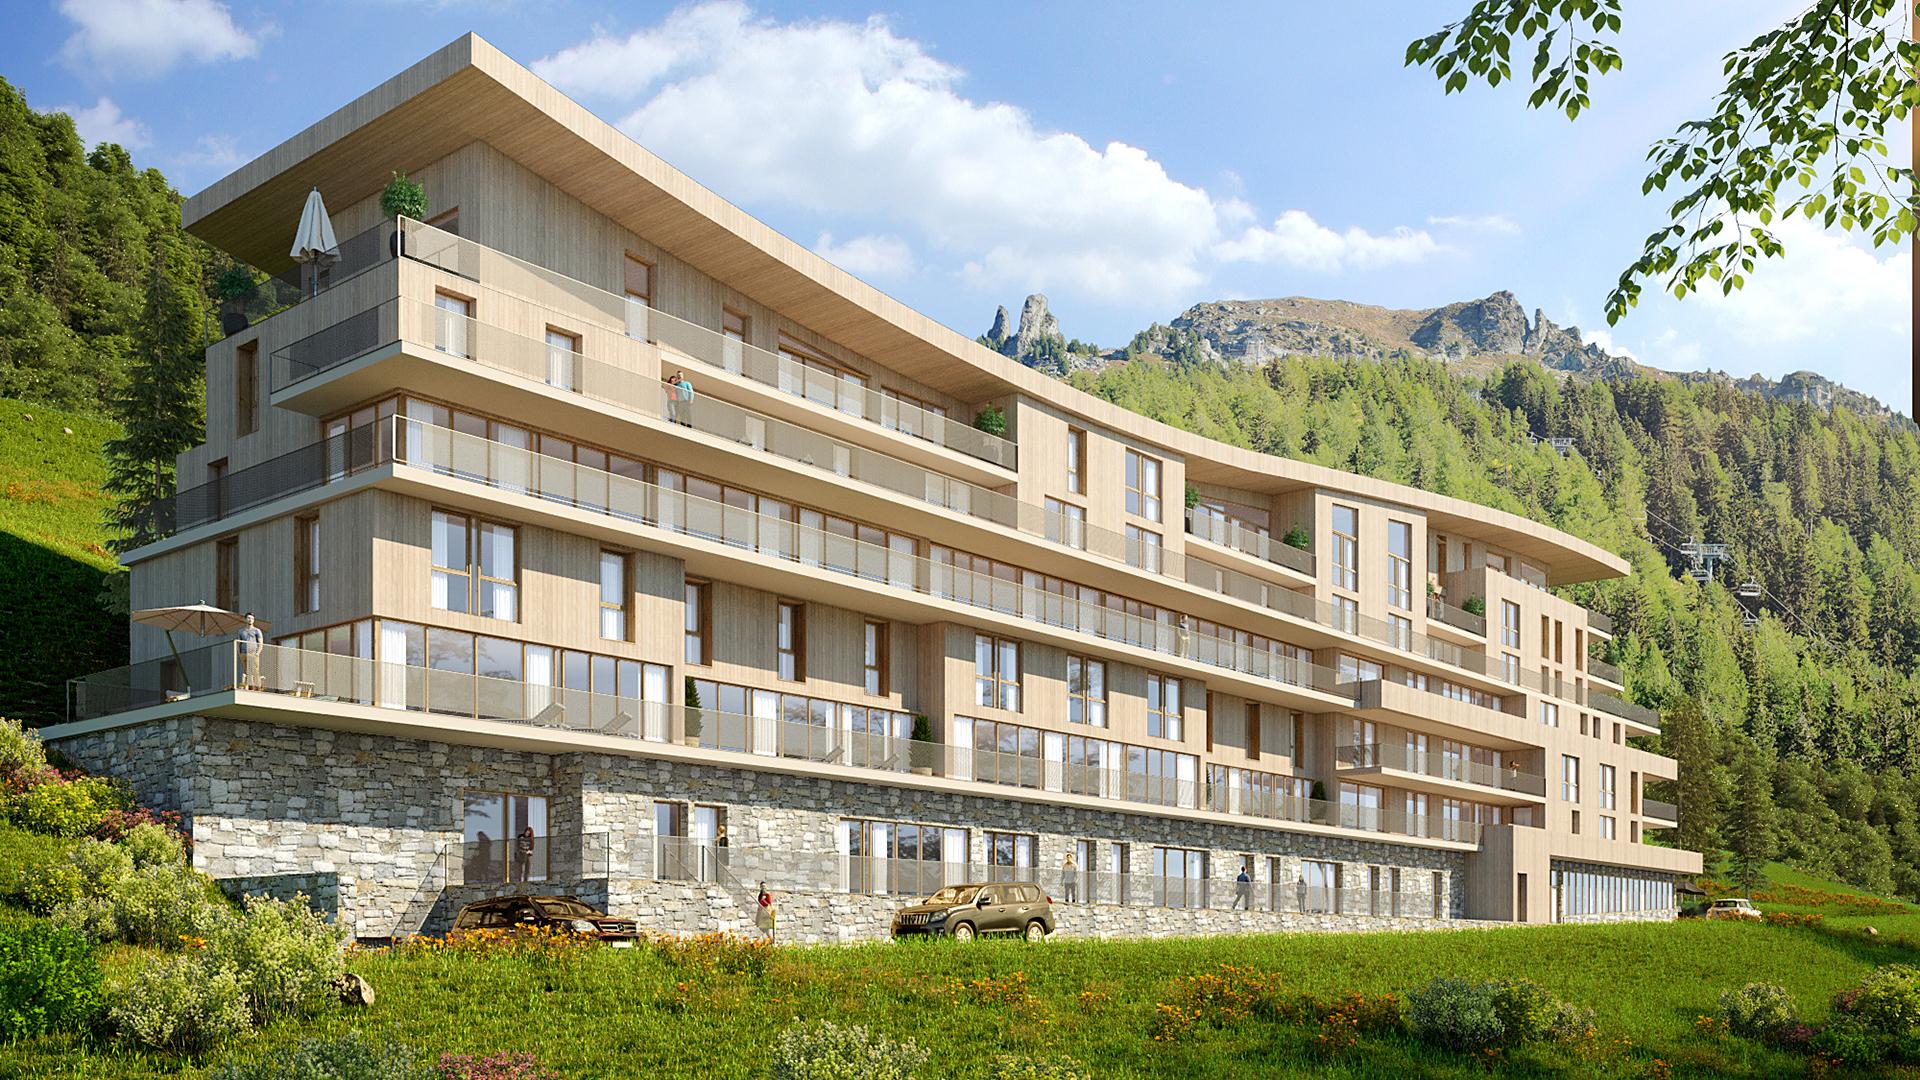 Le Ridge Apartments, France